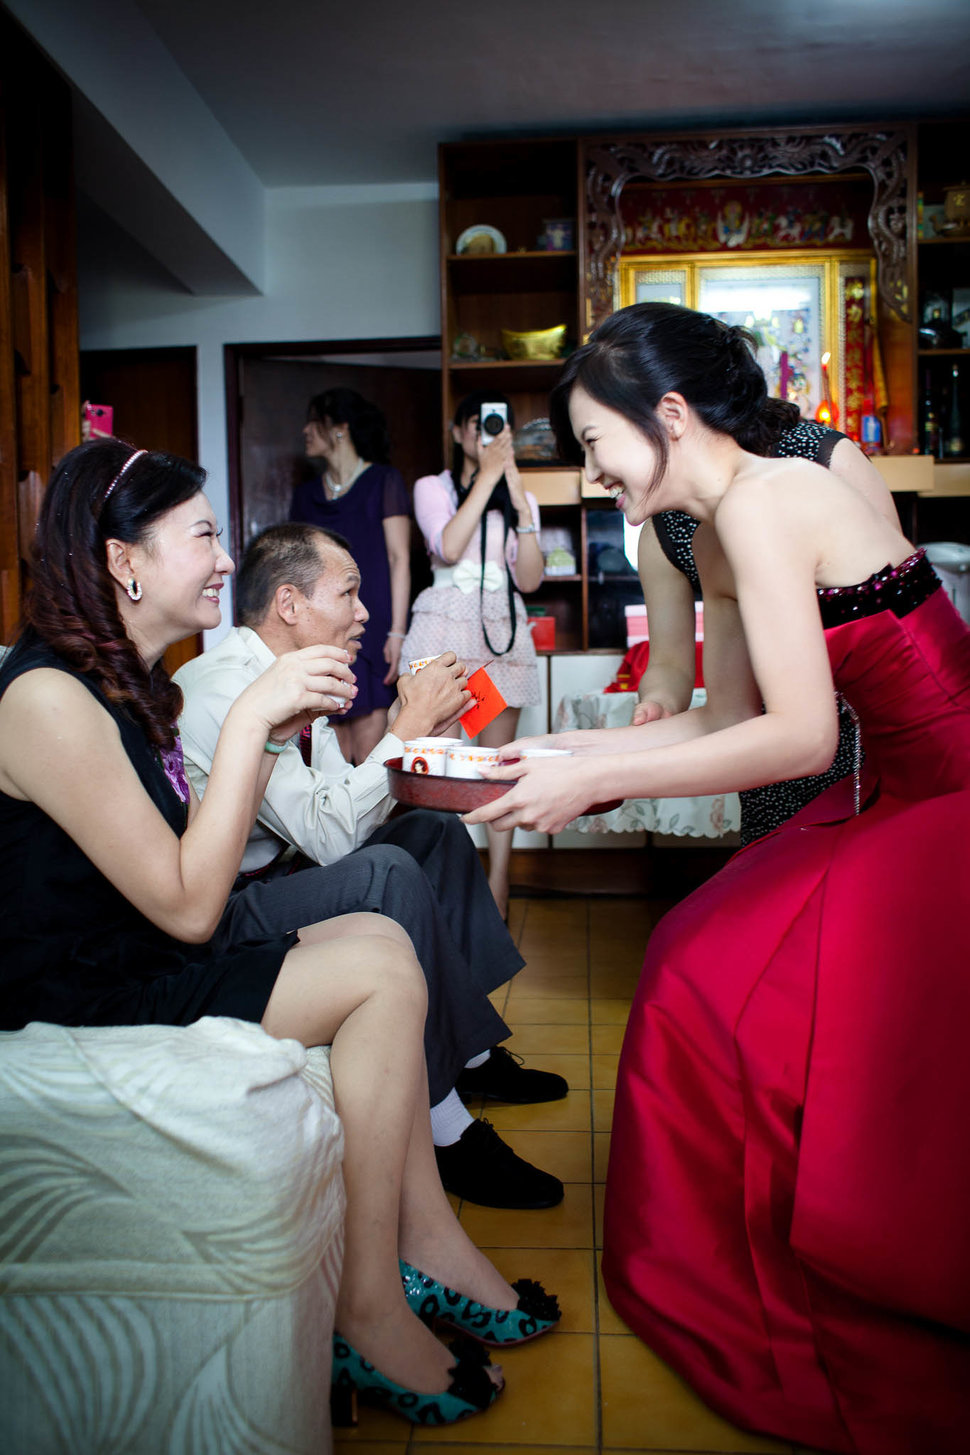 18PHOTO-敔帆❤️ 卿瑜(編號:242270) - 18PHOTO 婚紗影像攝影工作室 - 結婚吧一站式婚禮服務平台